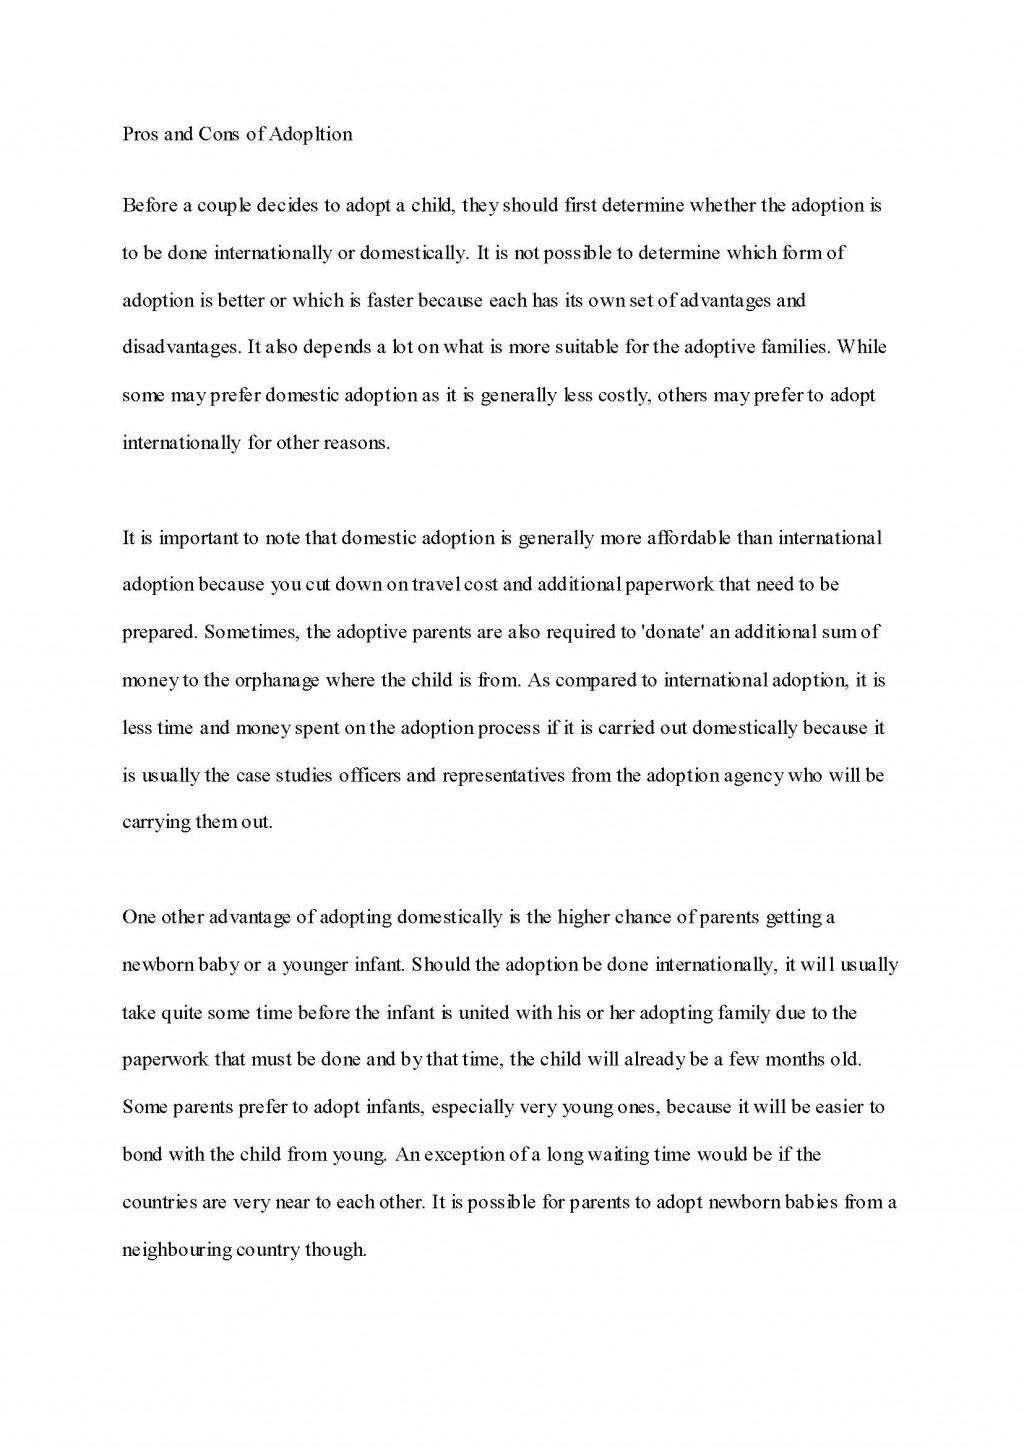 014 Process Essay Outline Adoption Samplecb Fantastic Template Pdf Large